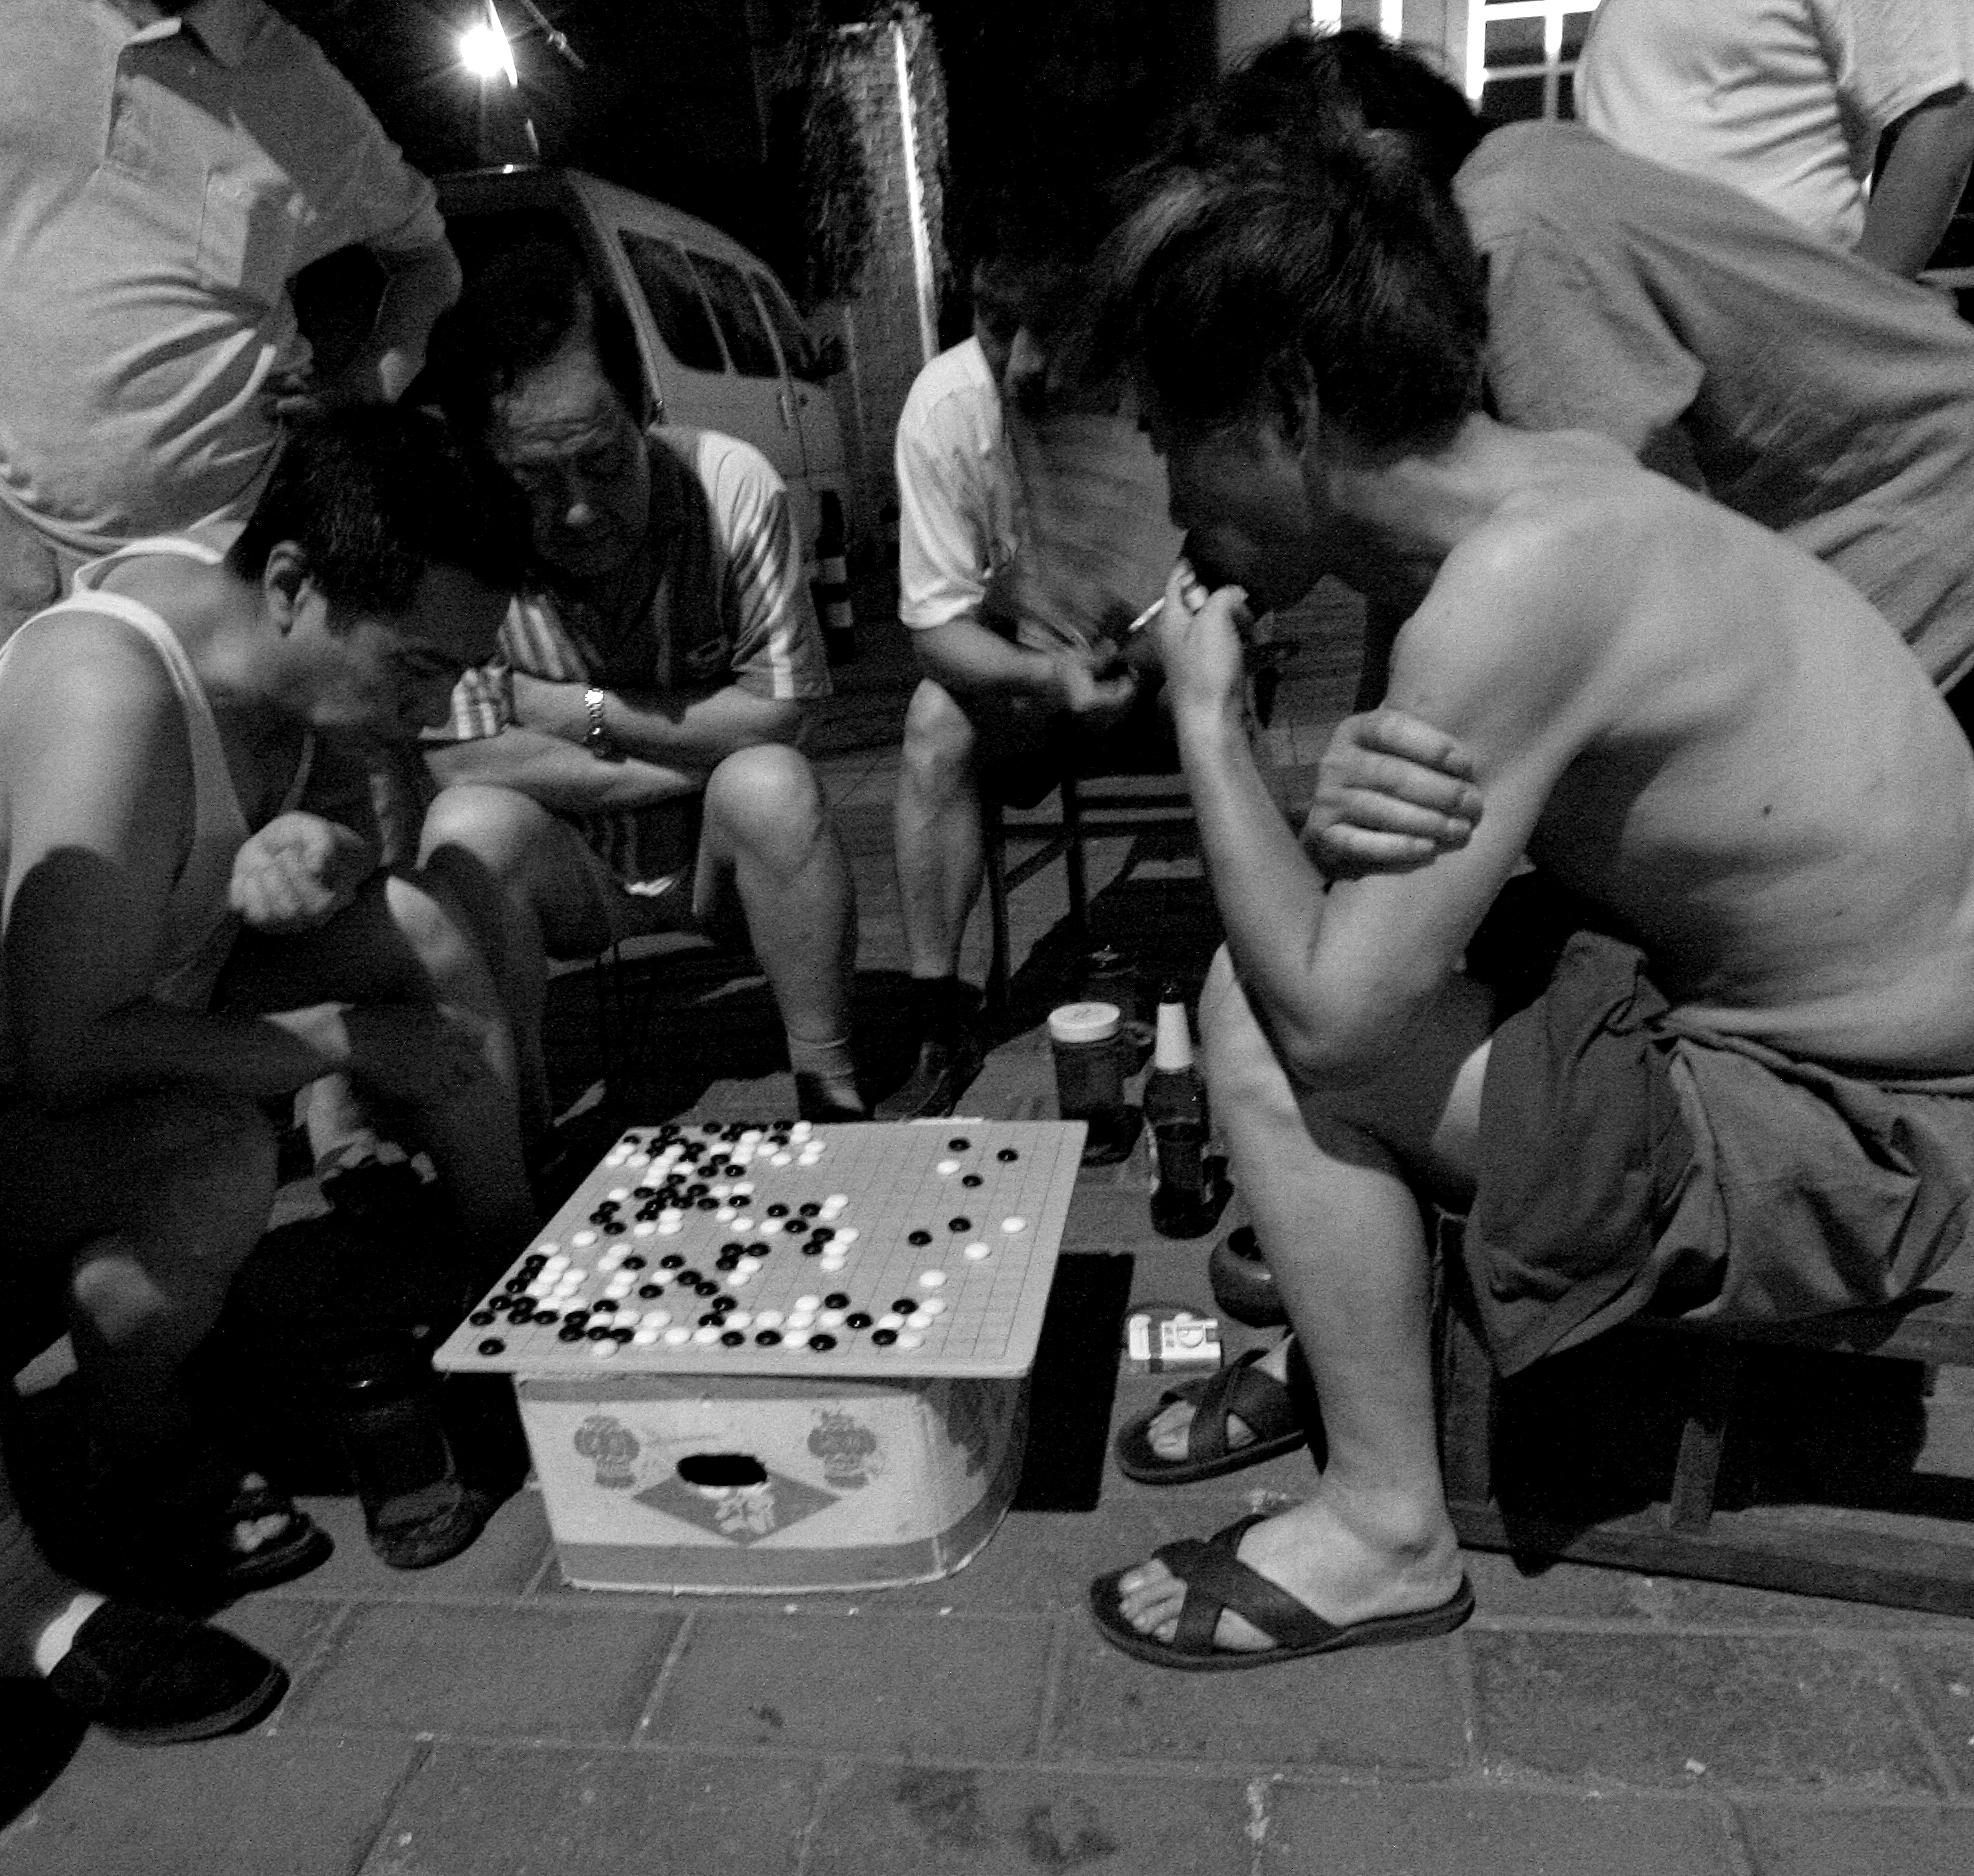 guys playing go